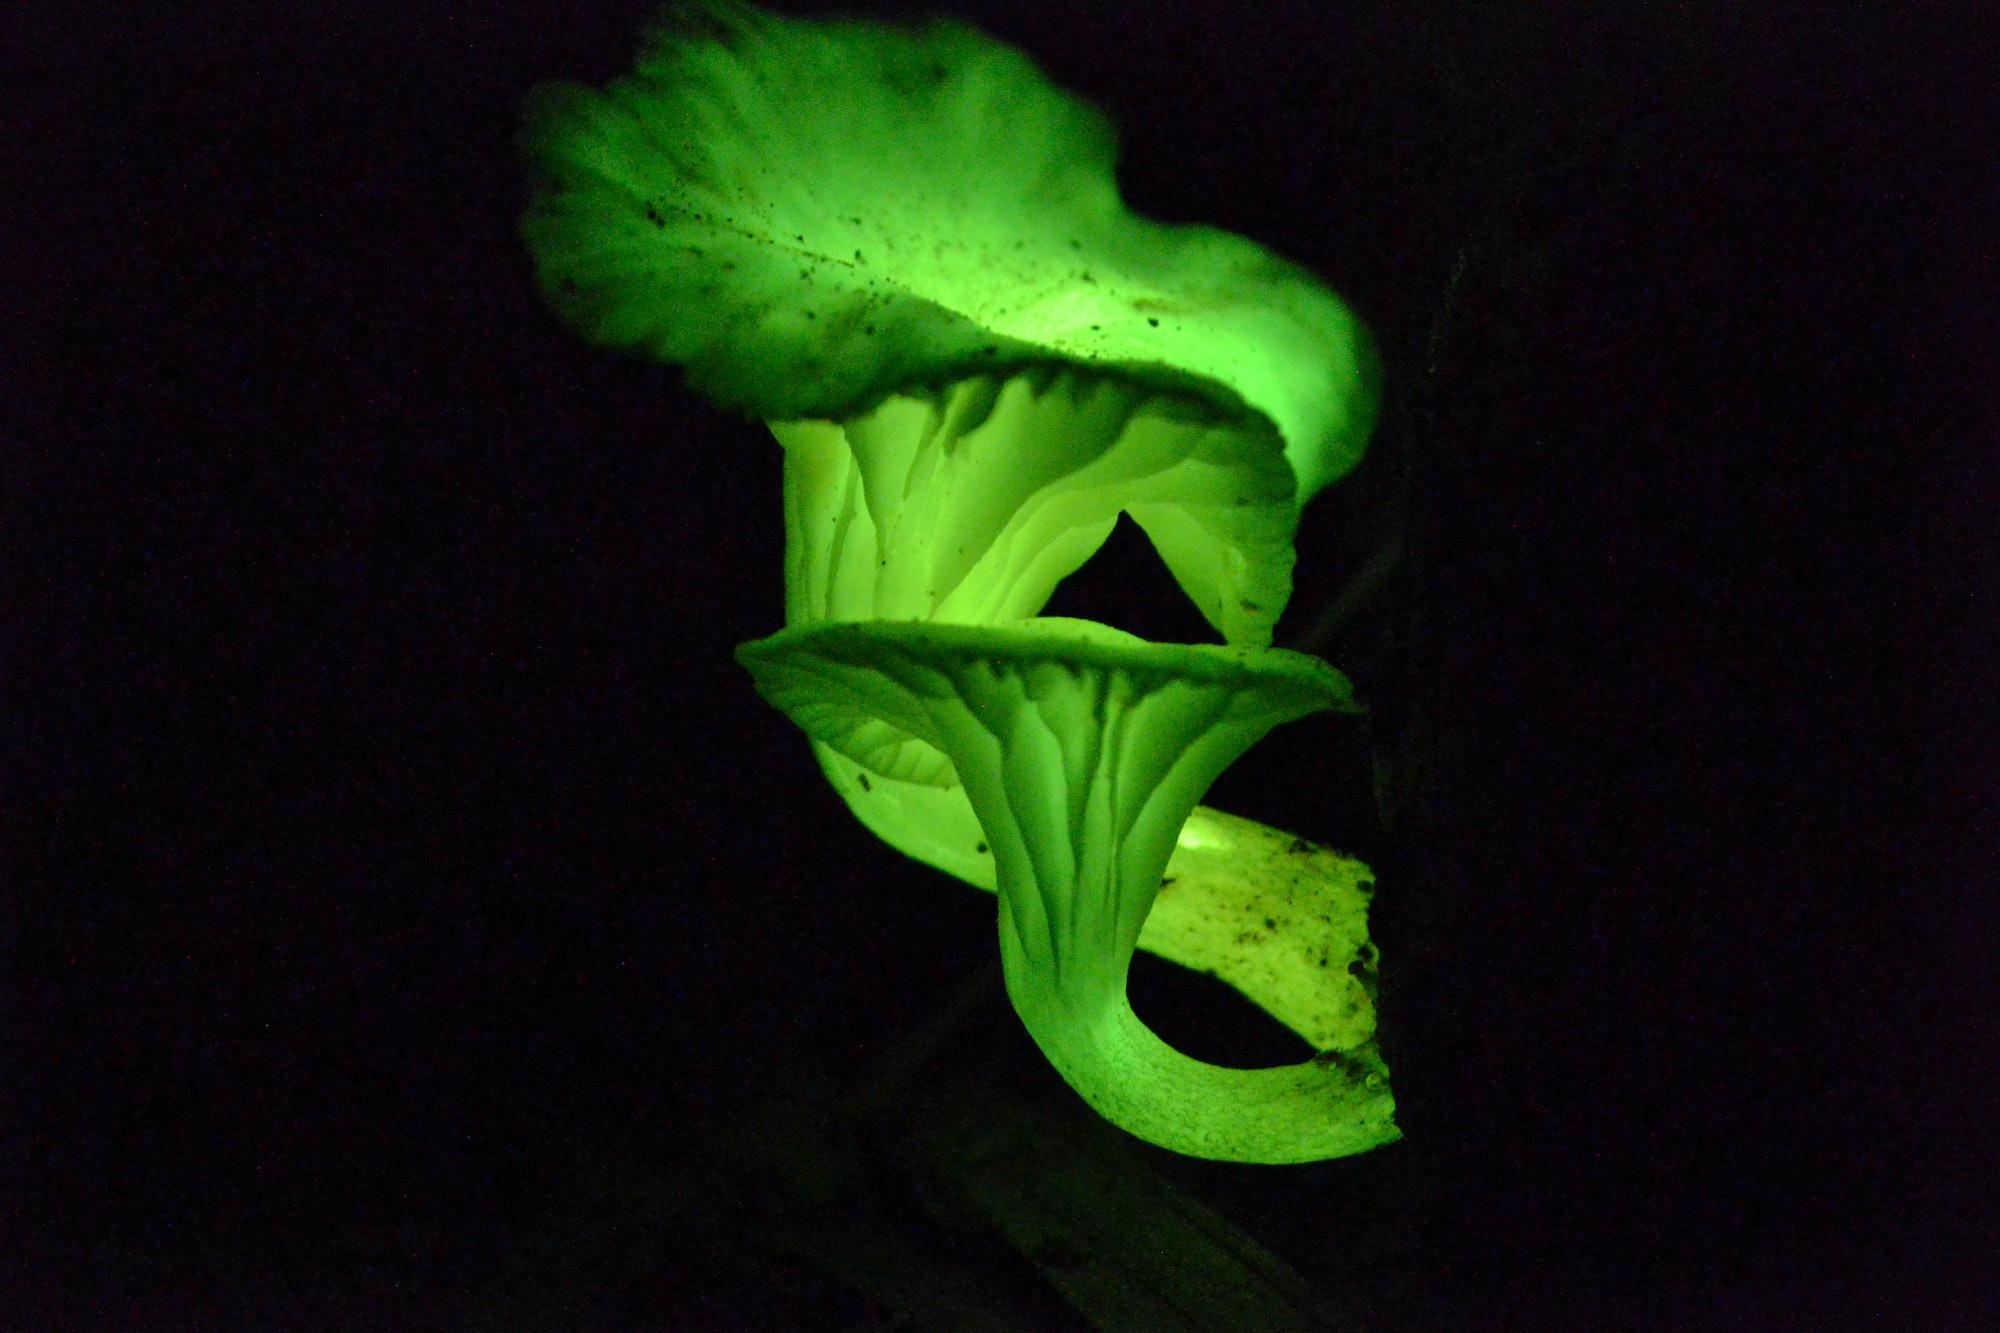 bioluminescent mushroom